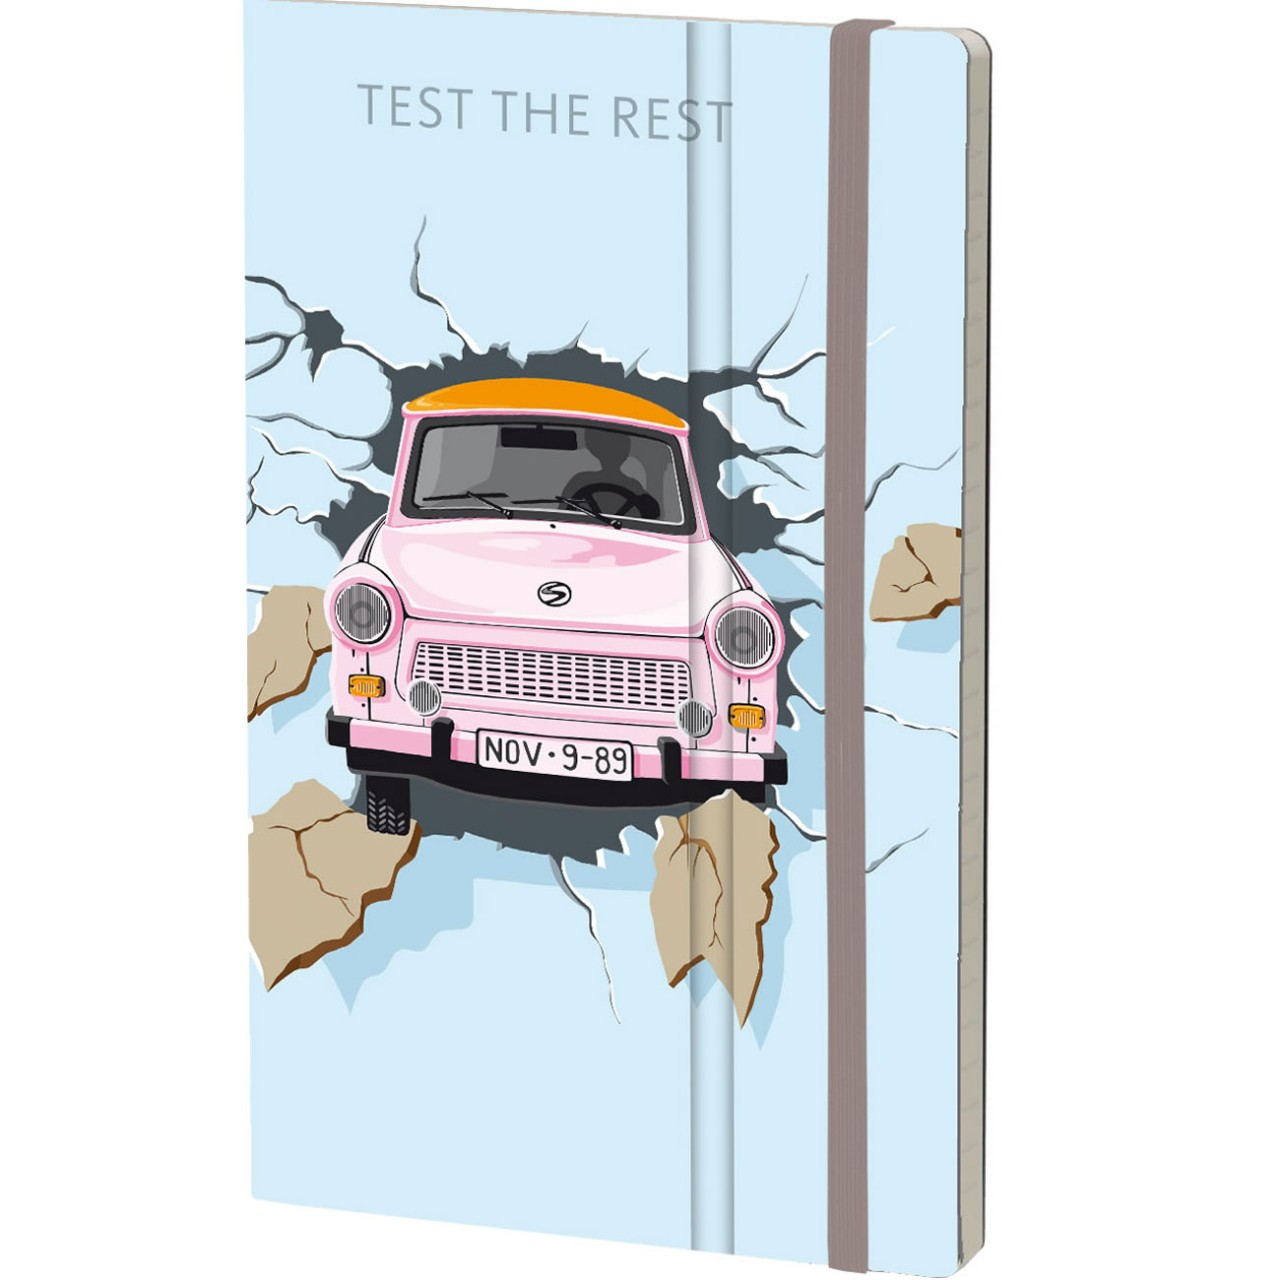 Stifflex Notizbuch THE WALL 13 x 21 cm 192 S., TEST THE REST - BLUE